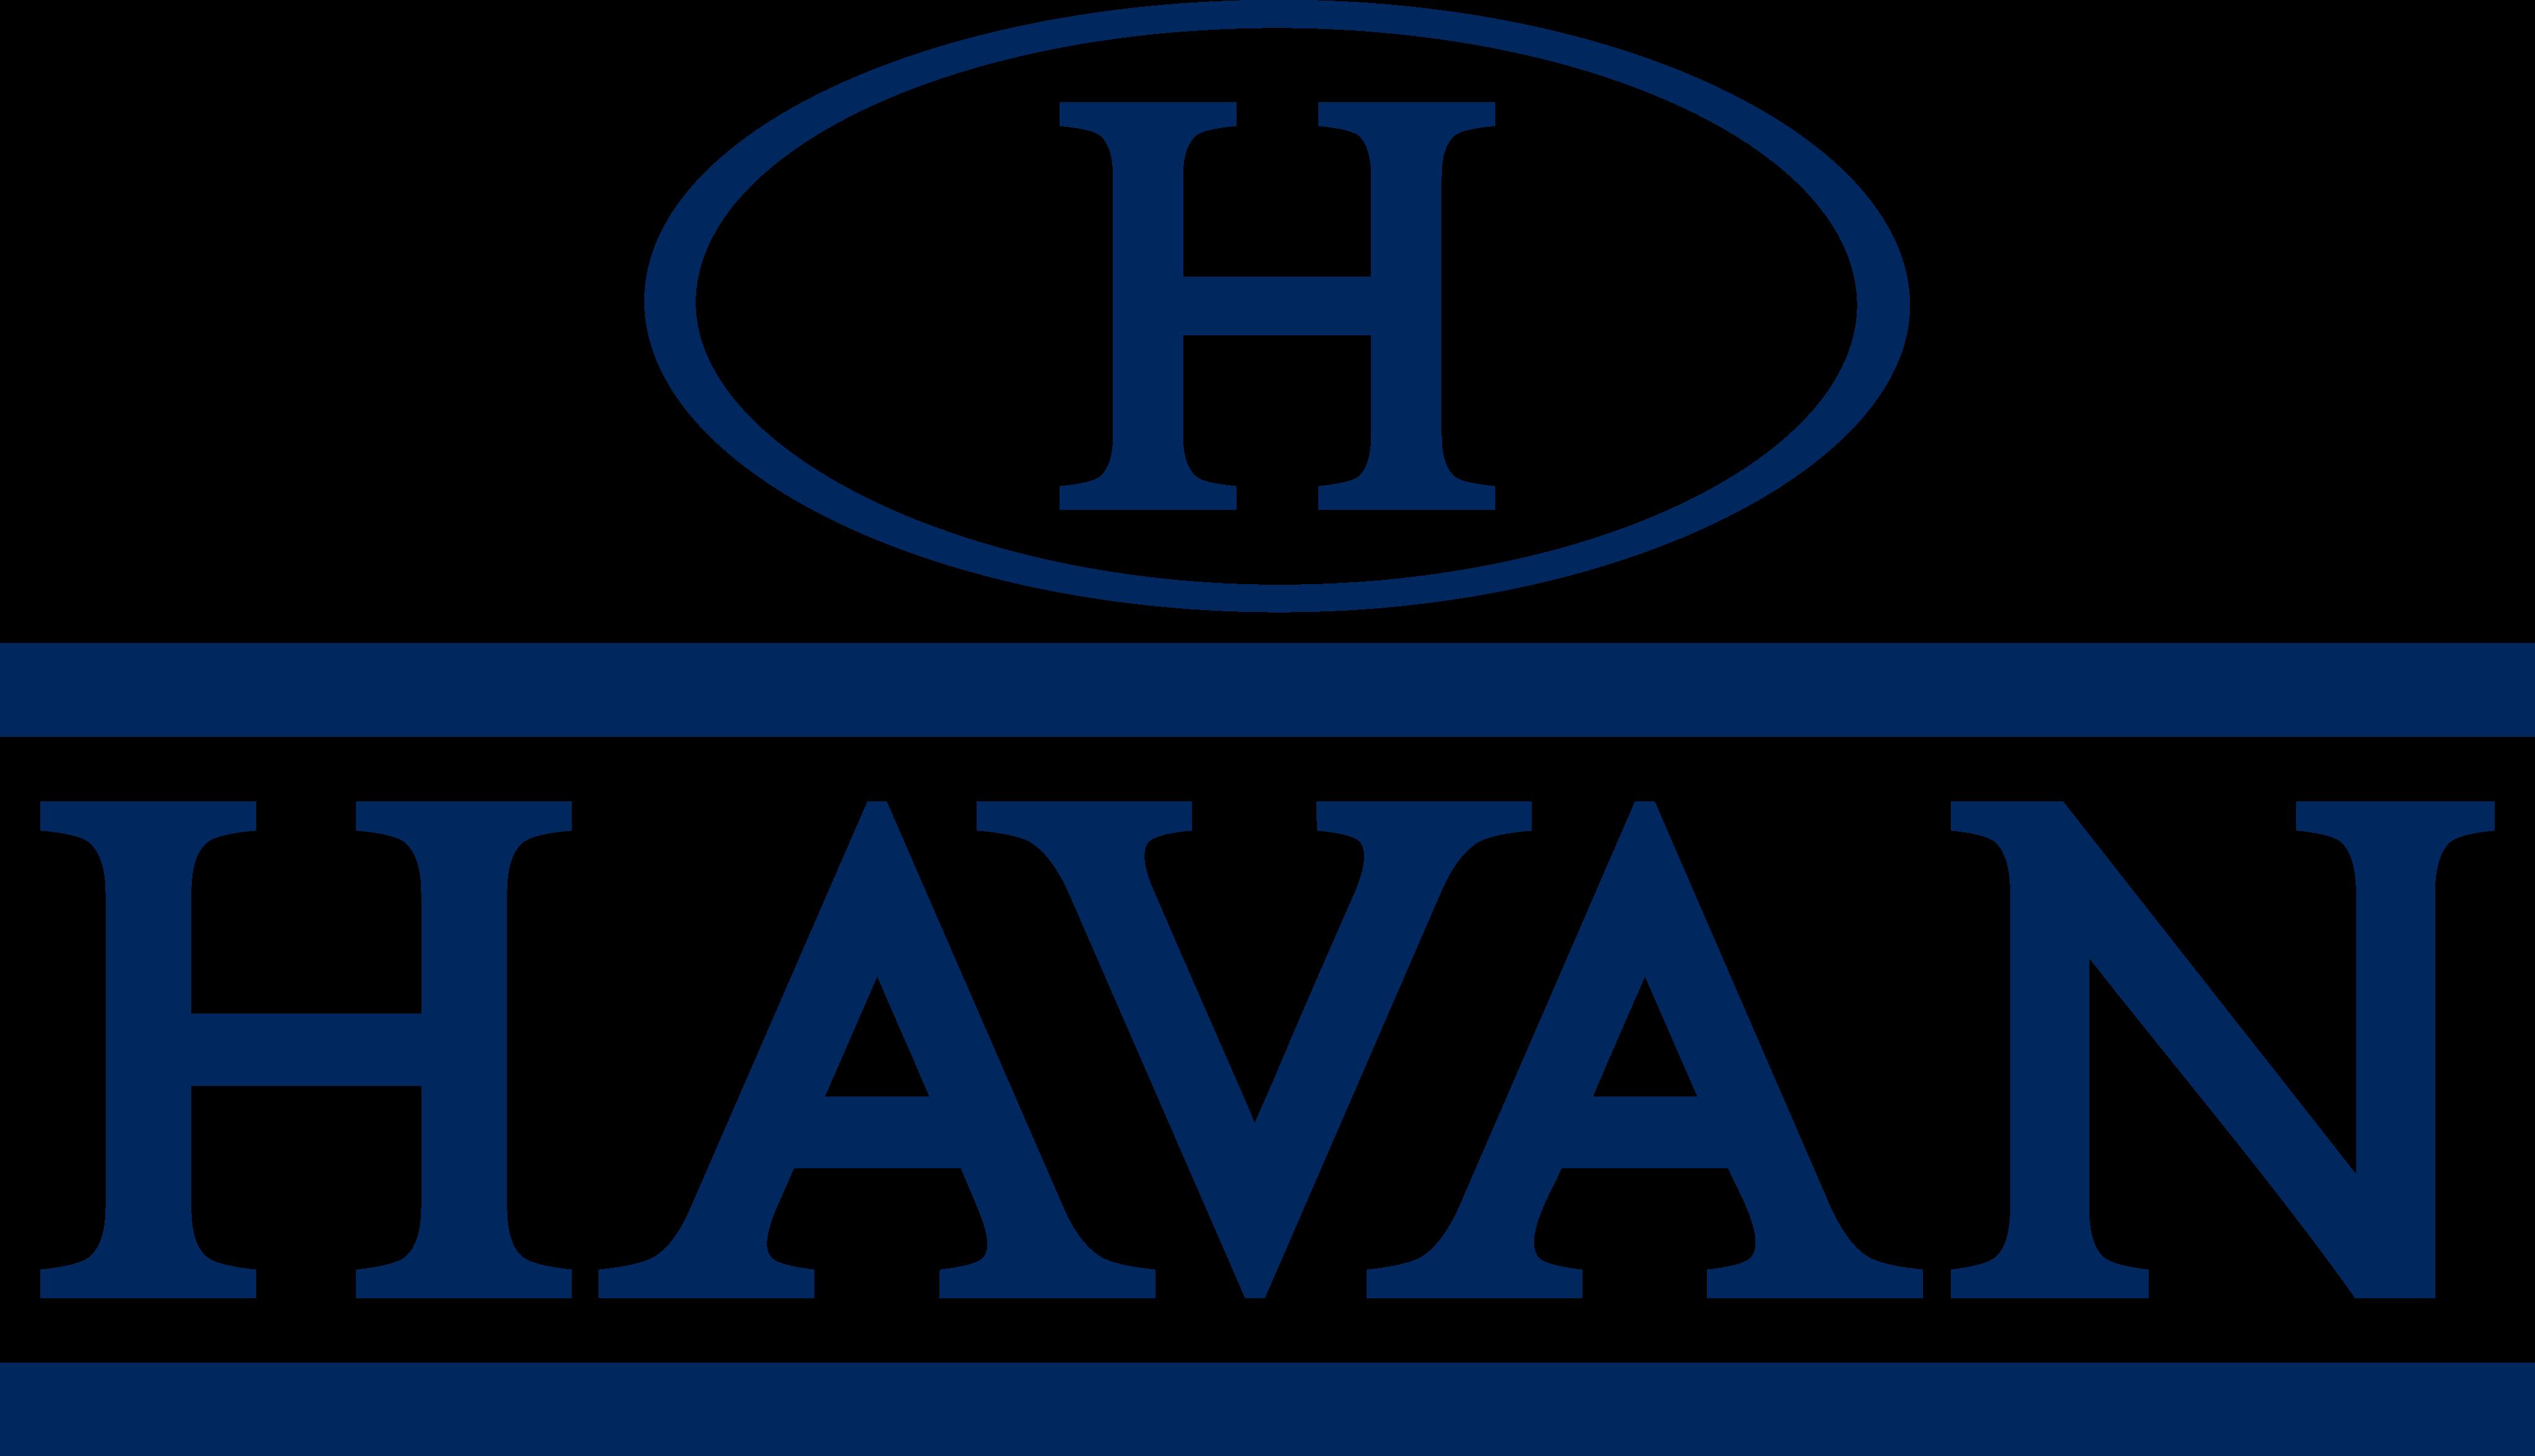 havan logo - Havan Logo